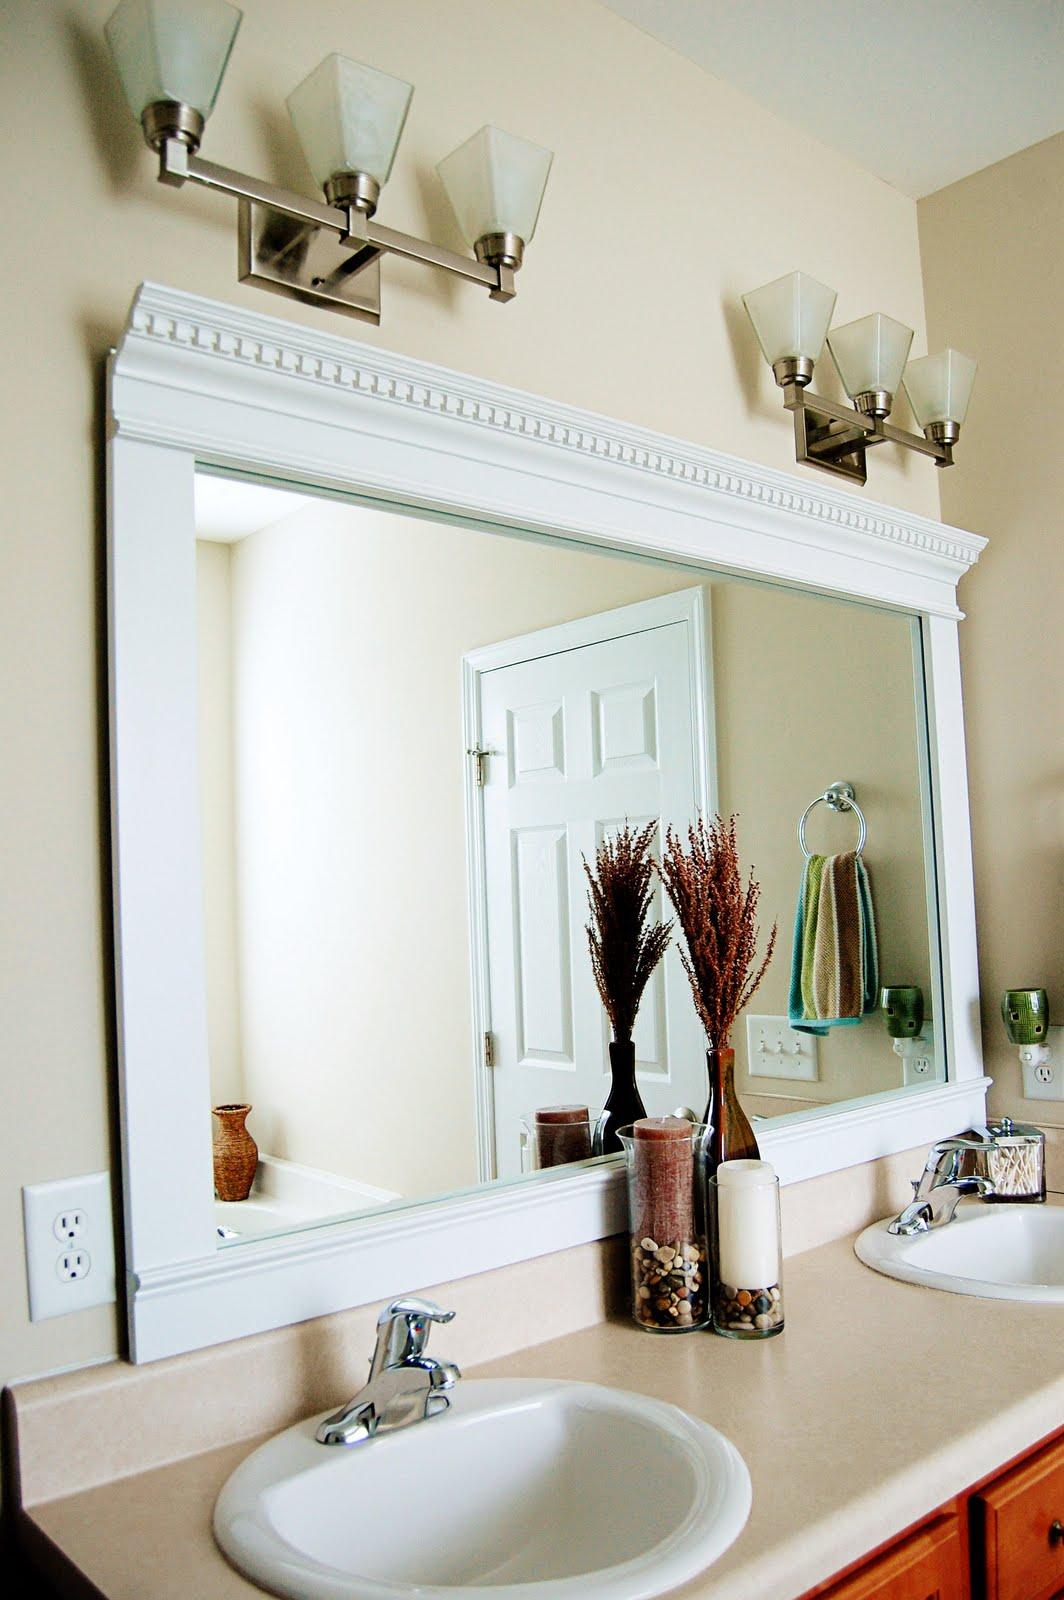 Framed Bathroom Mirrors Ideas: Organize And Decorate